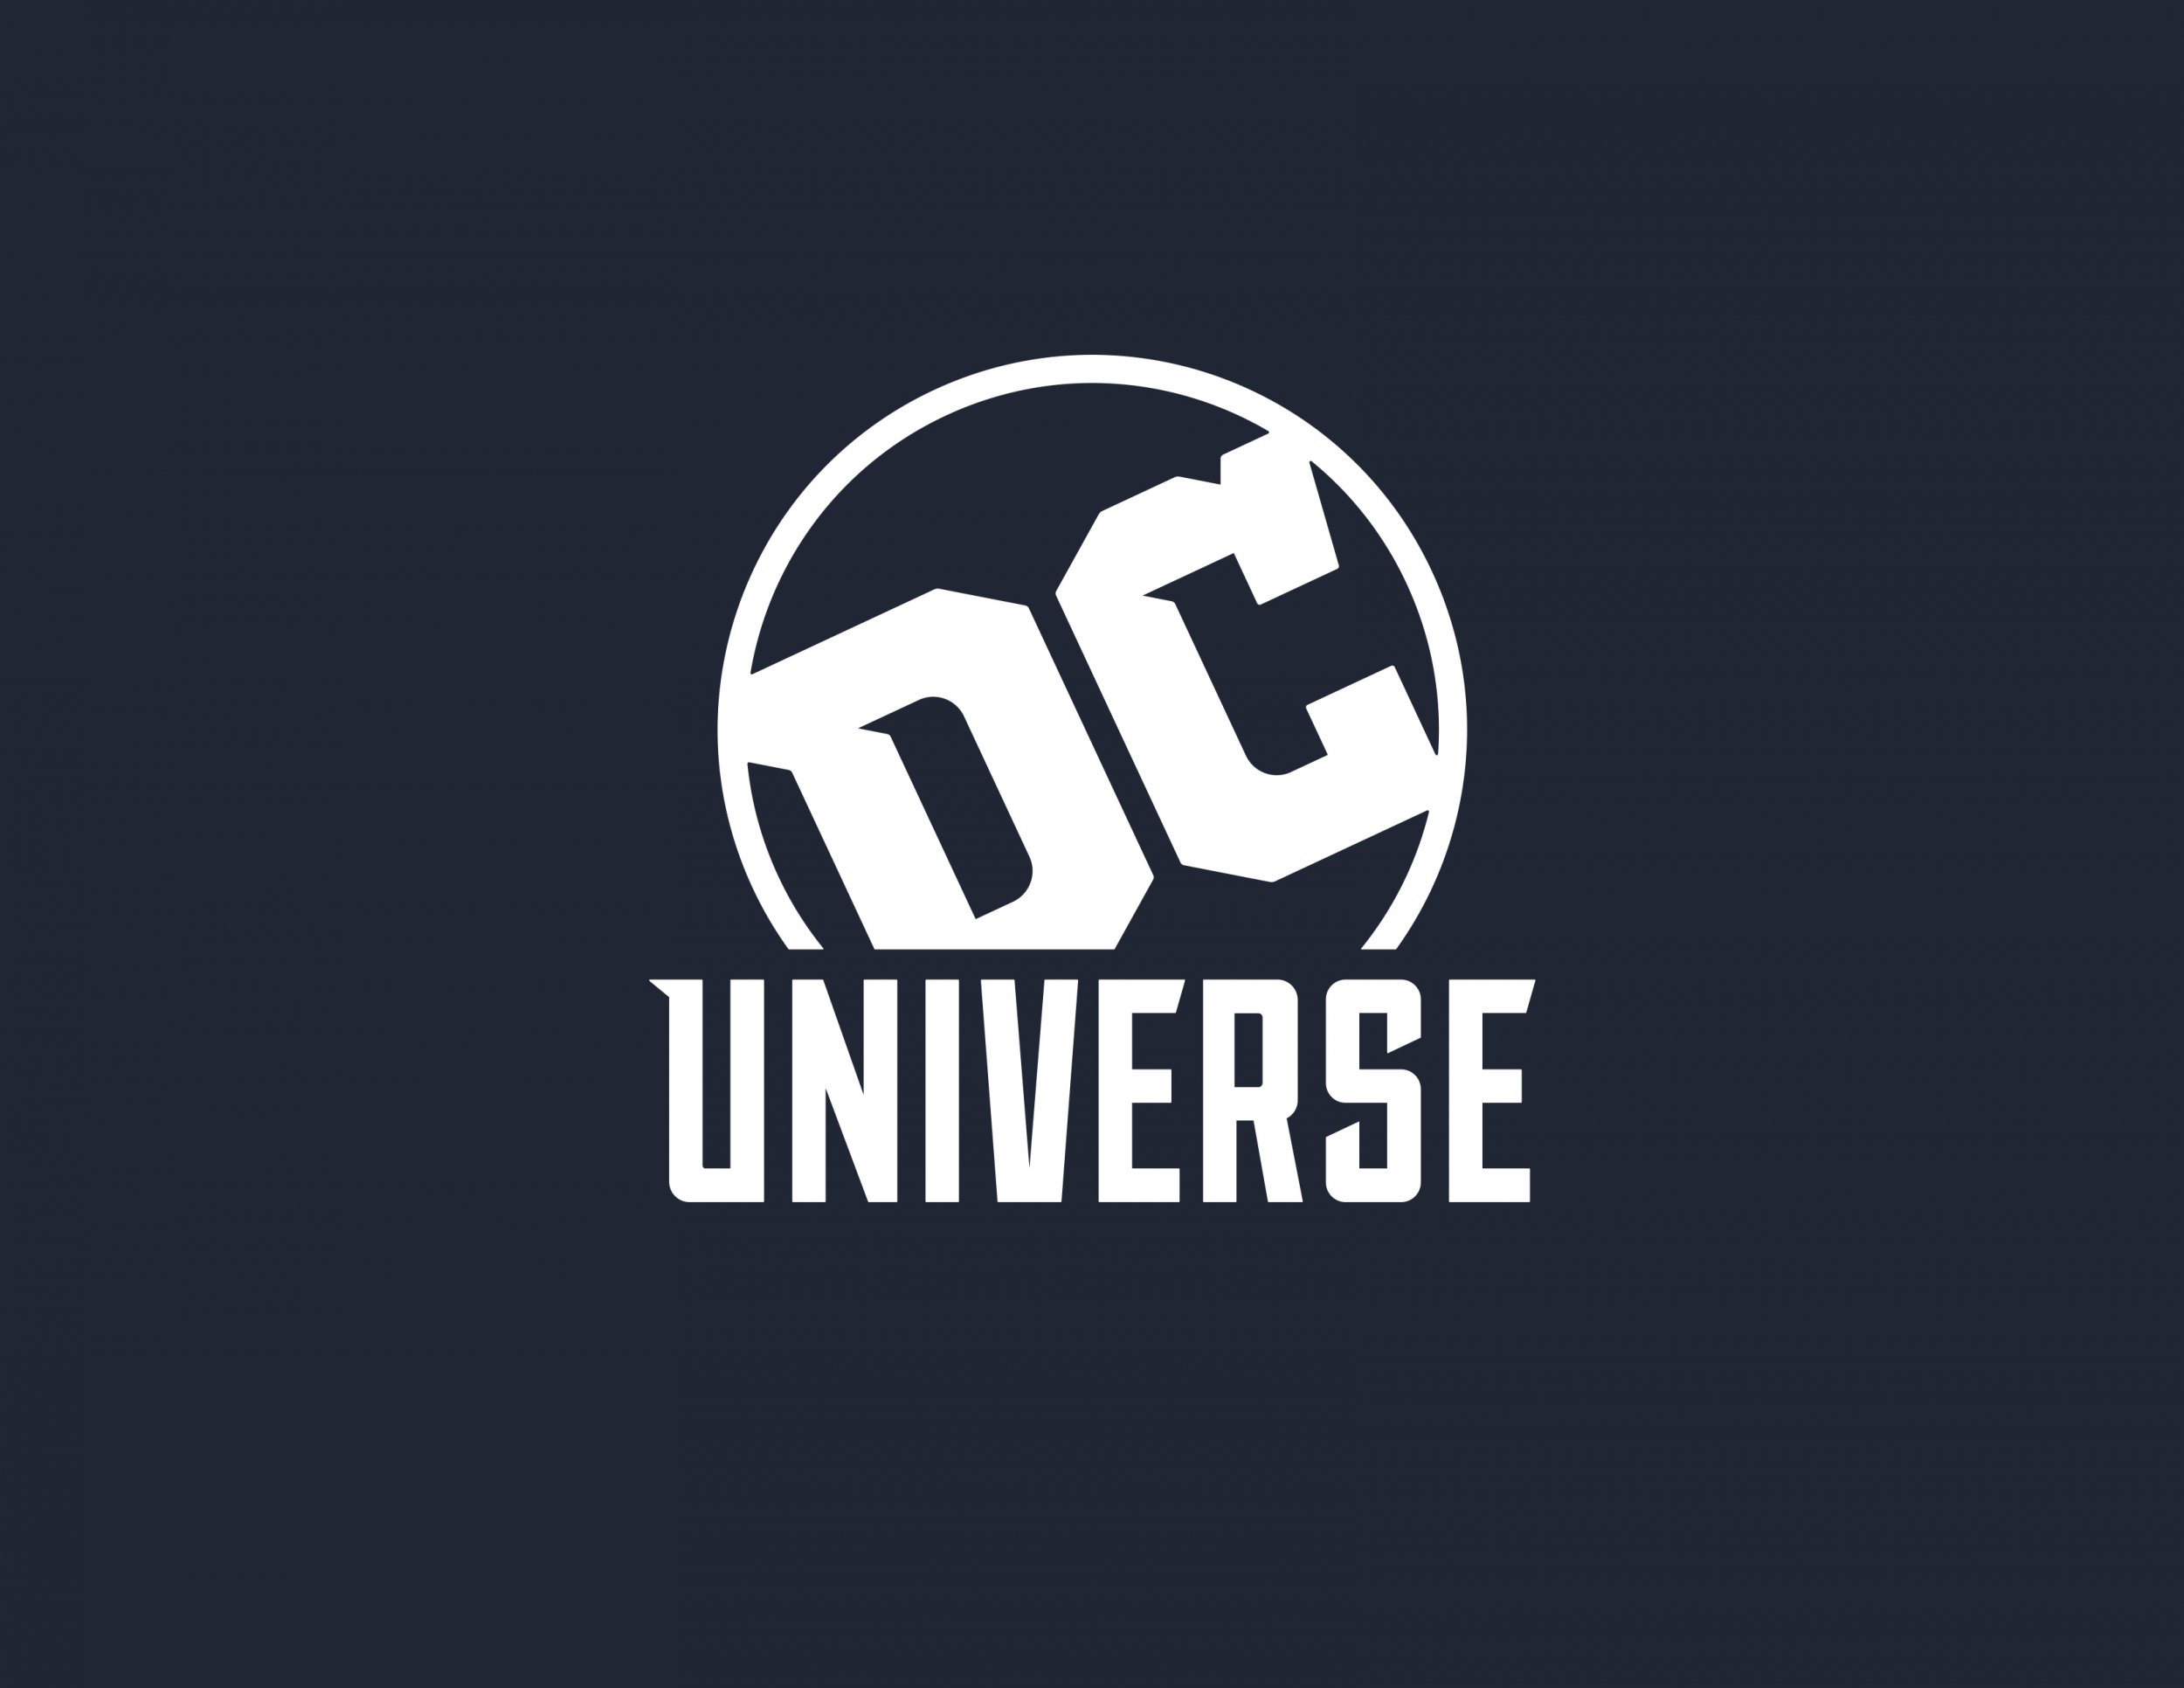 DC UNIVERSE LOGO streaming service beta